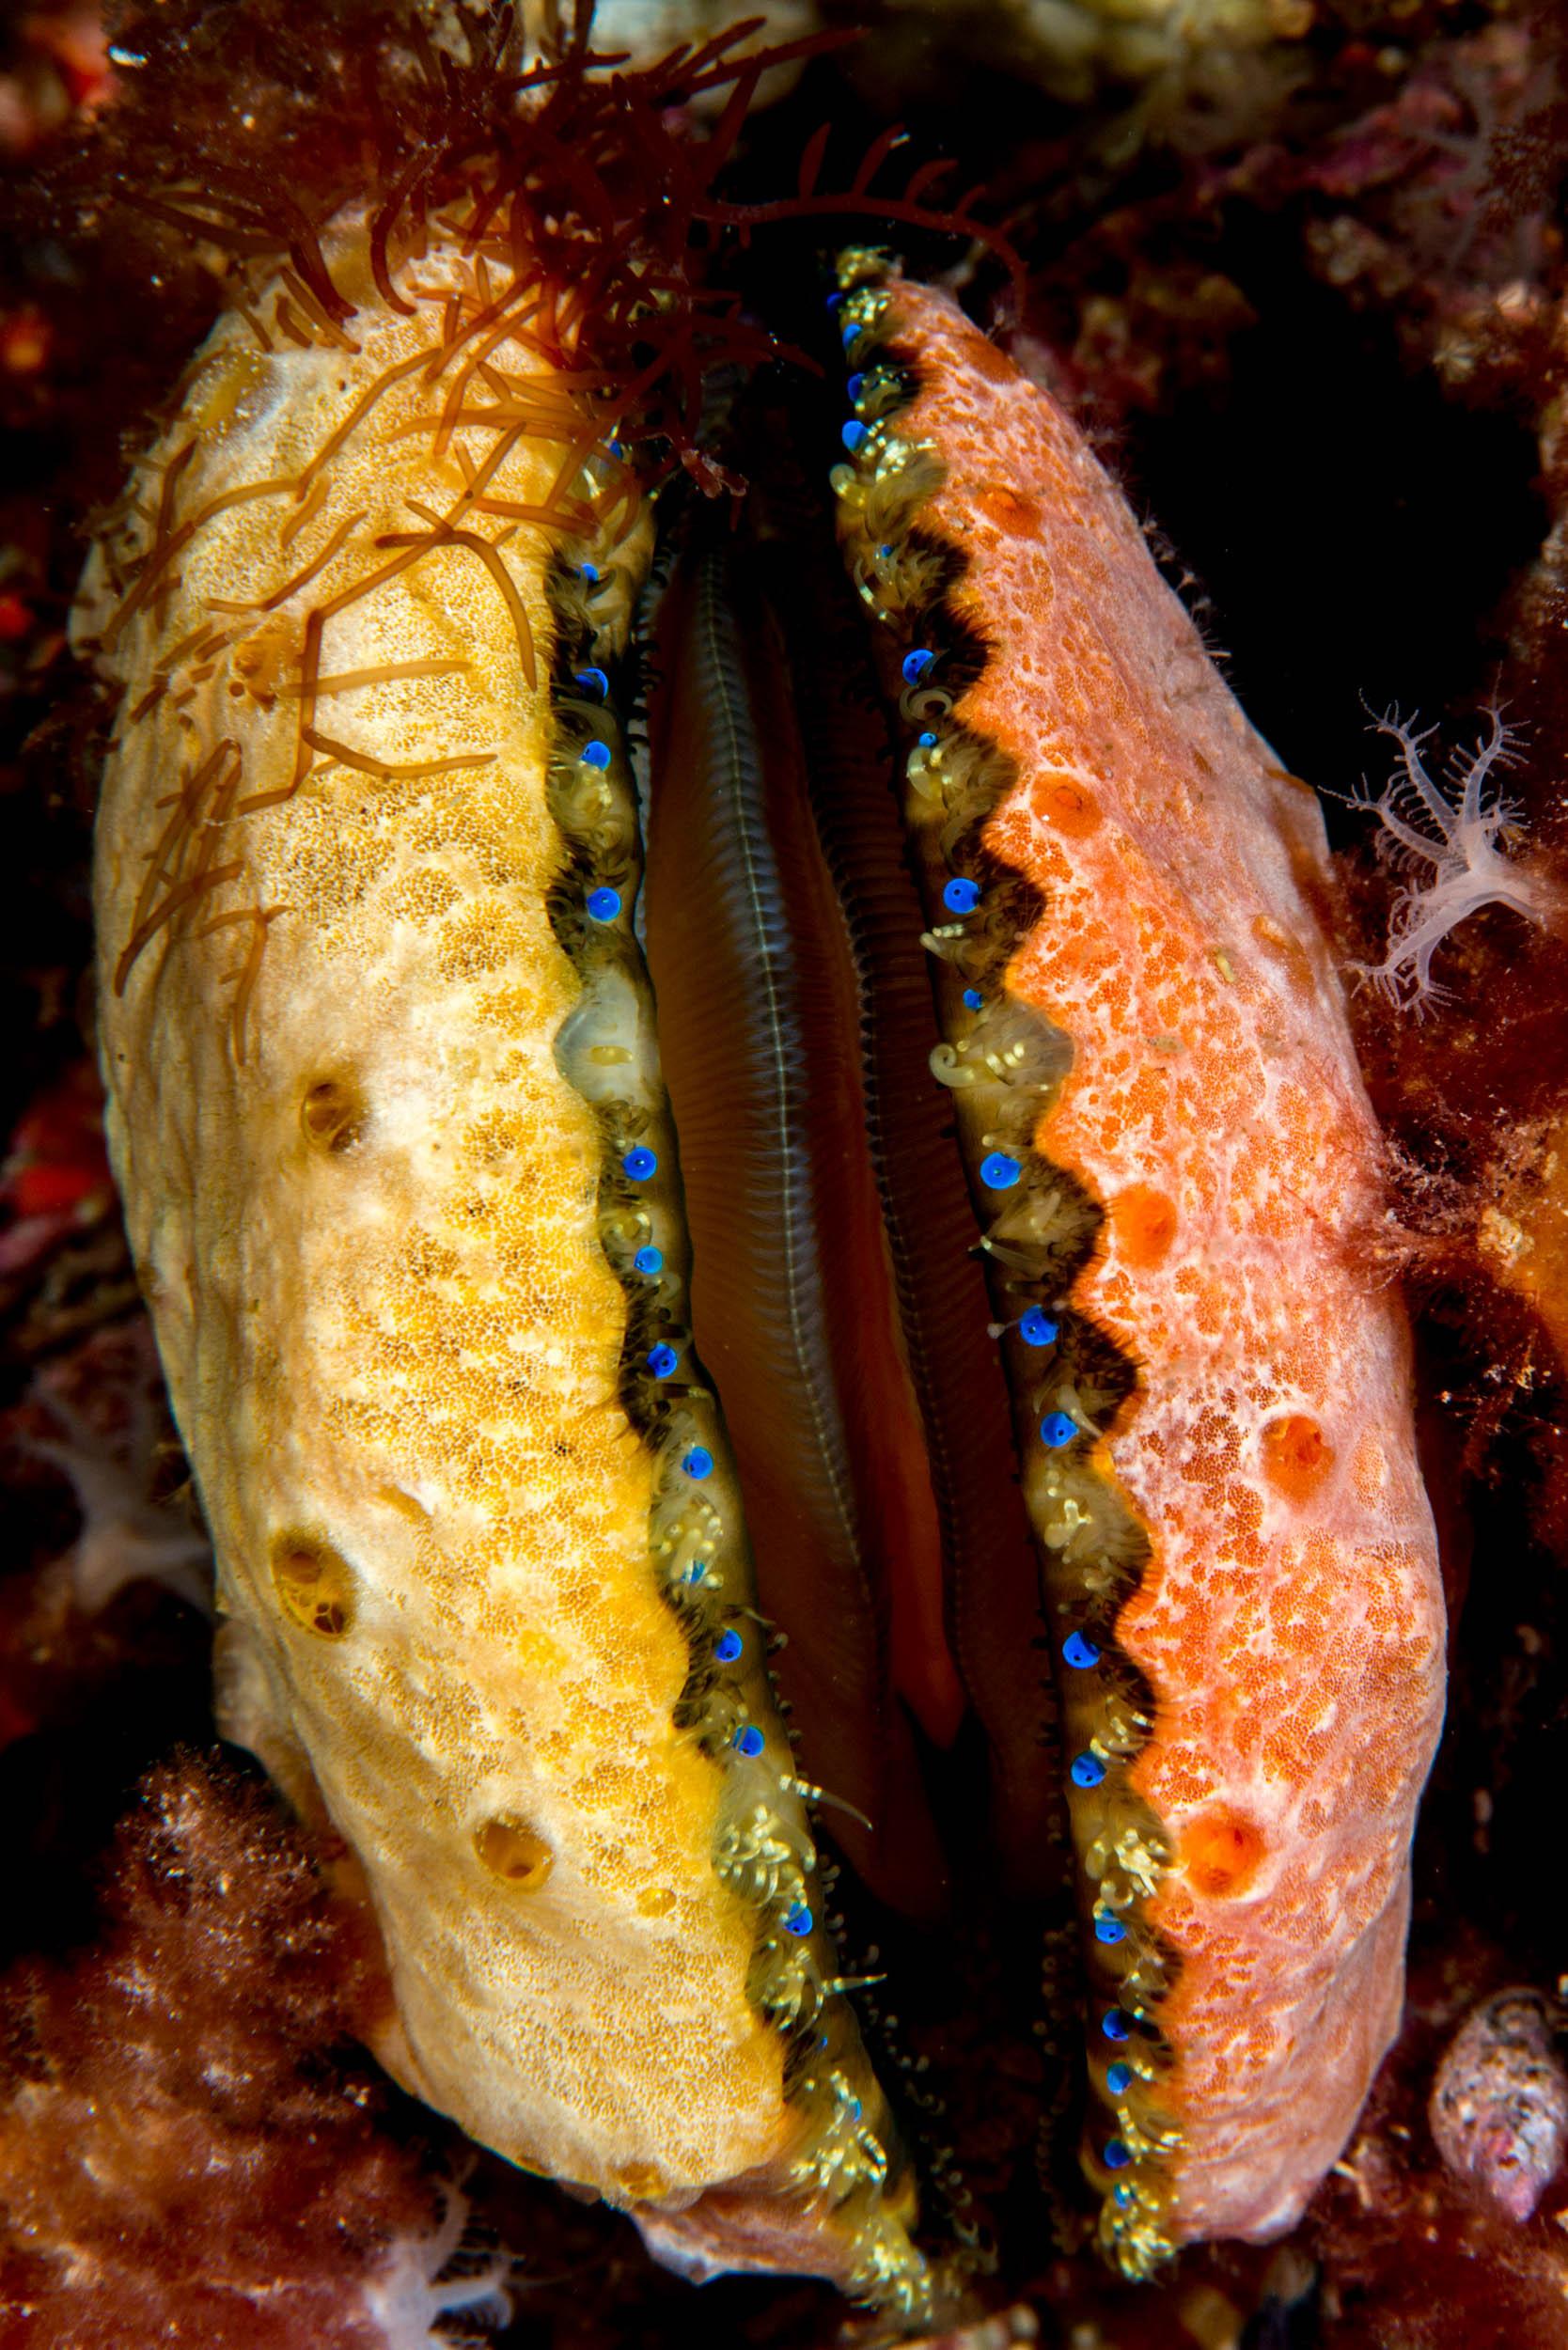 Doughboy scallop (Mimachlamys asperrima)